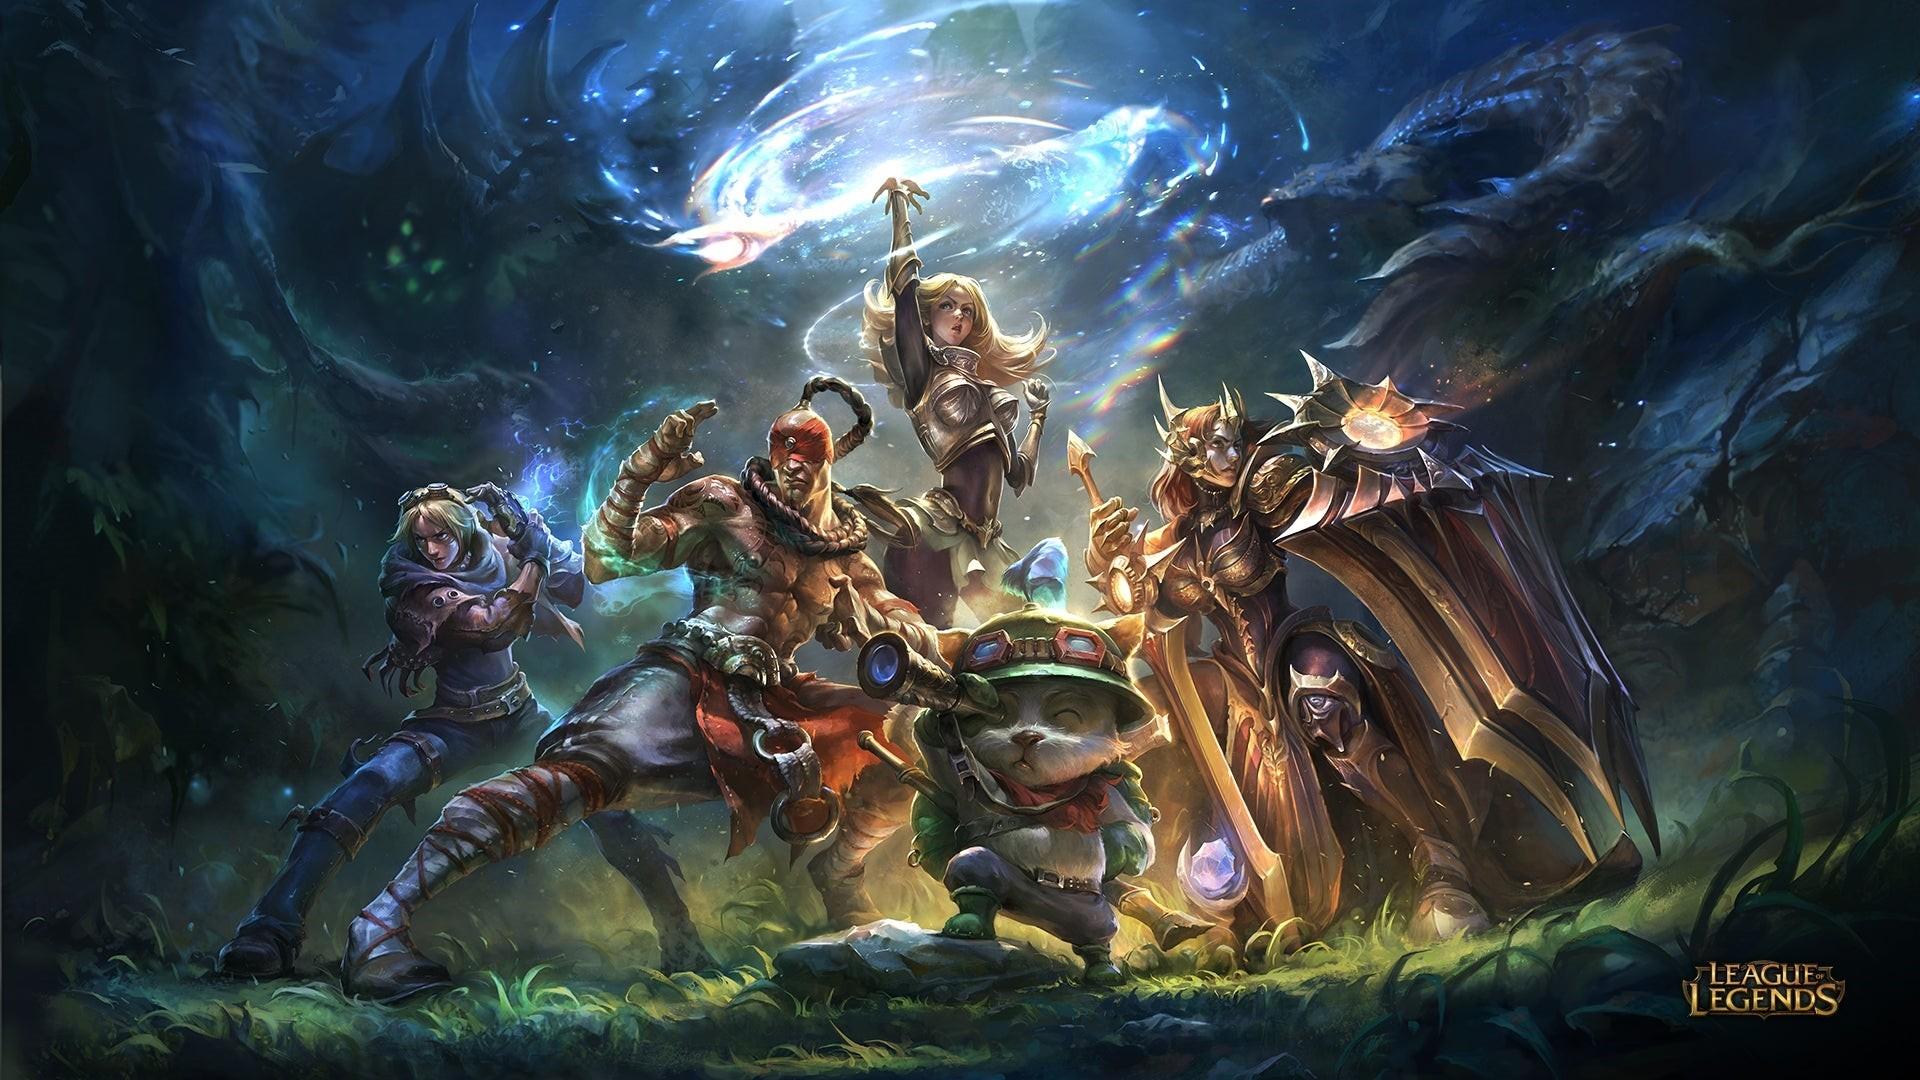 League Of Legends full wallpaper